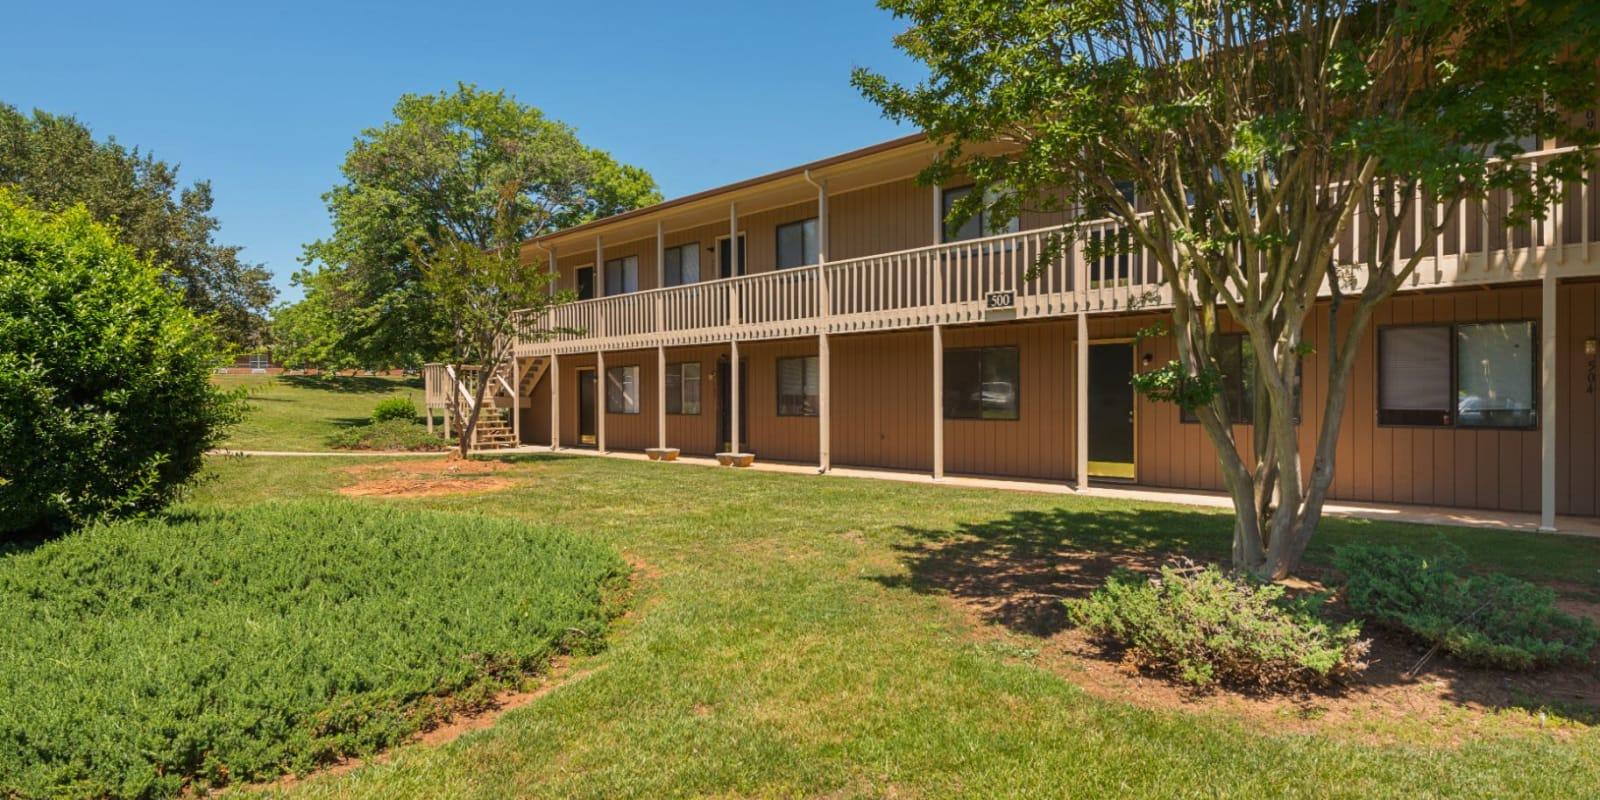 Garden-style buildings at Lakewood Apartment Homes in Salisbury, North Carolina